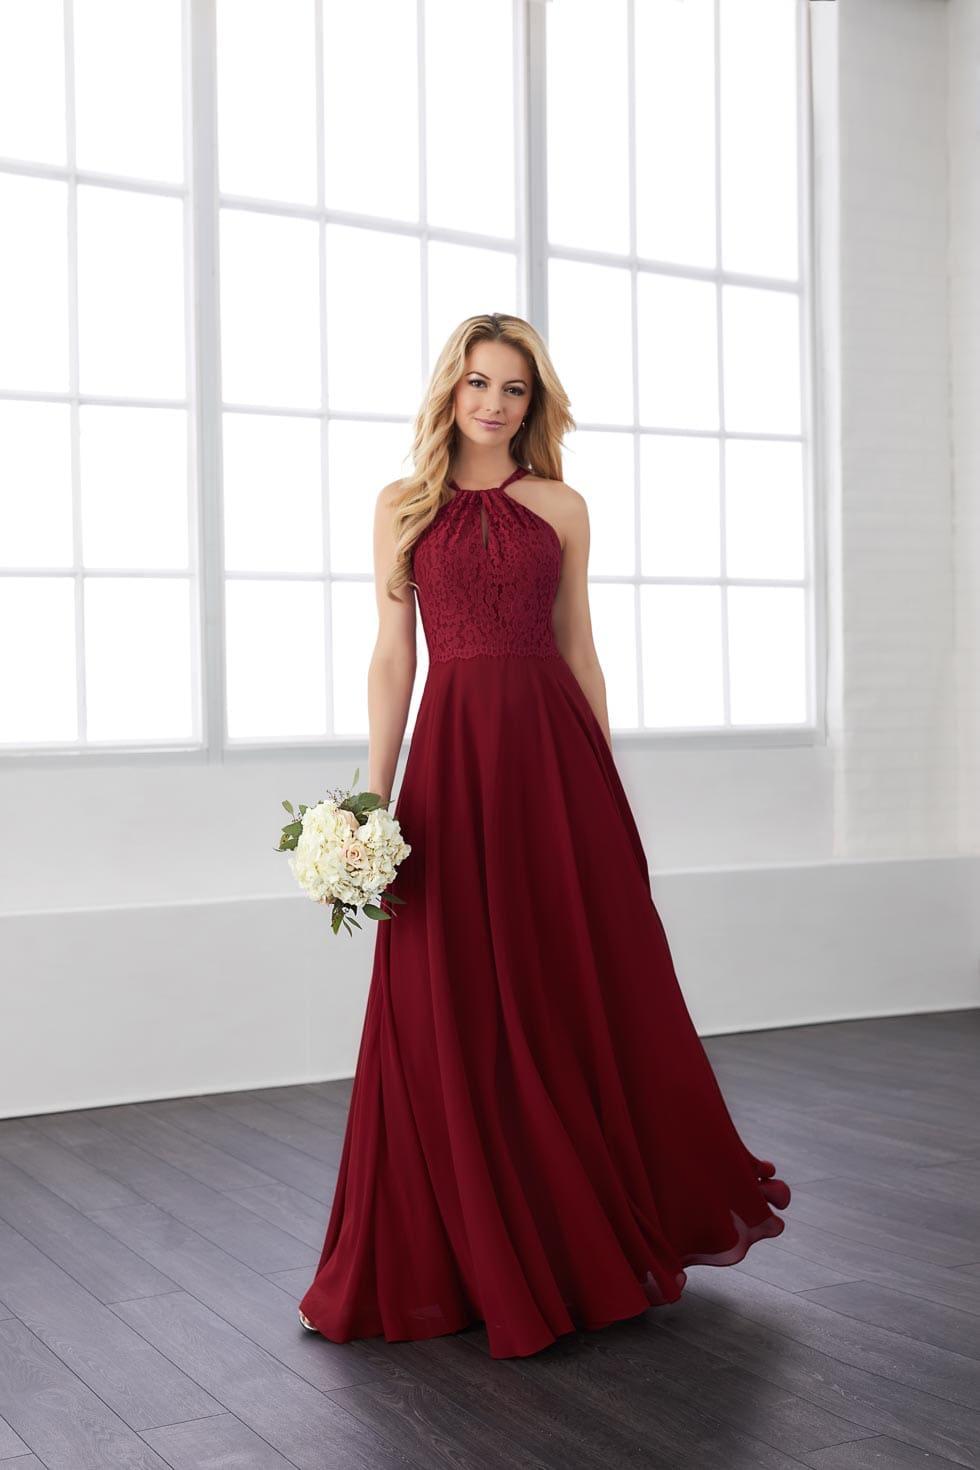 Brautjungfernkleid Rot